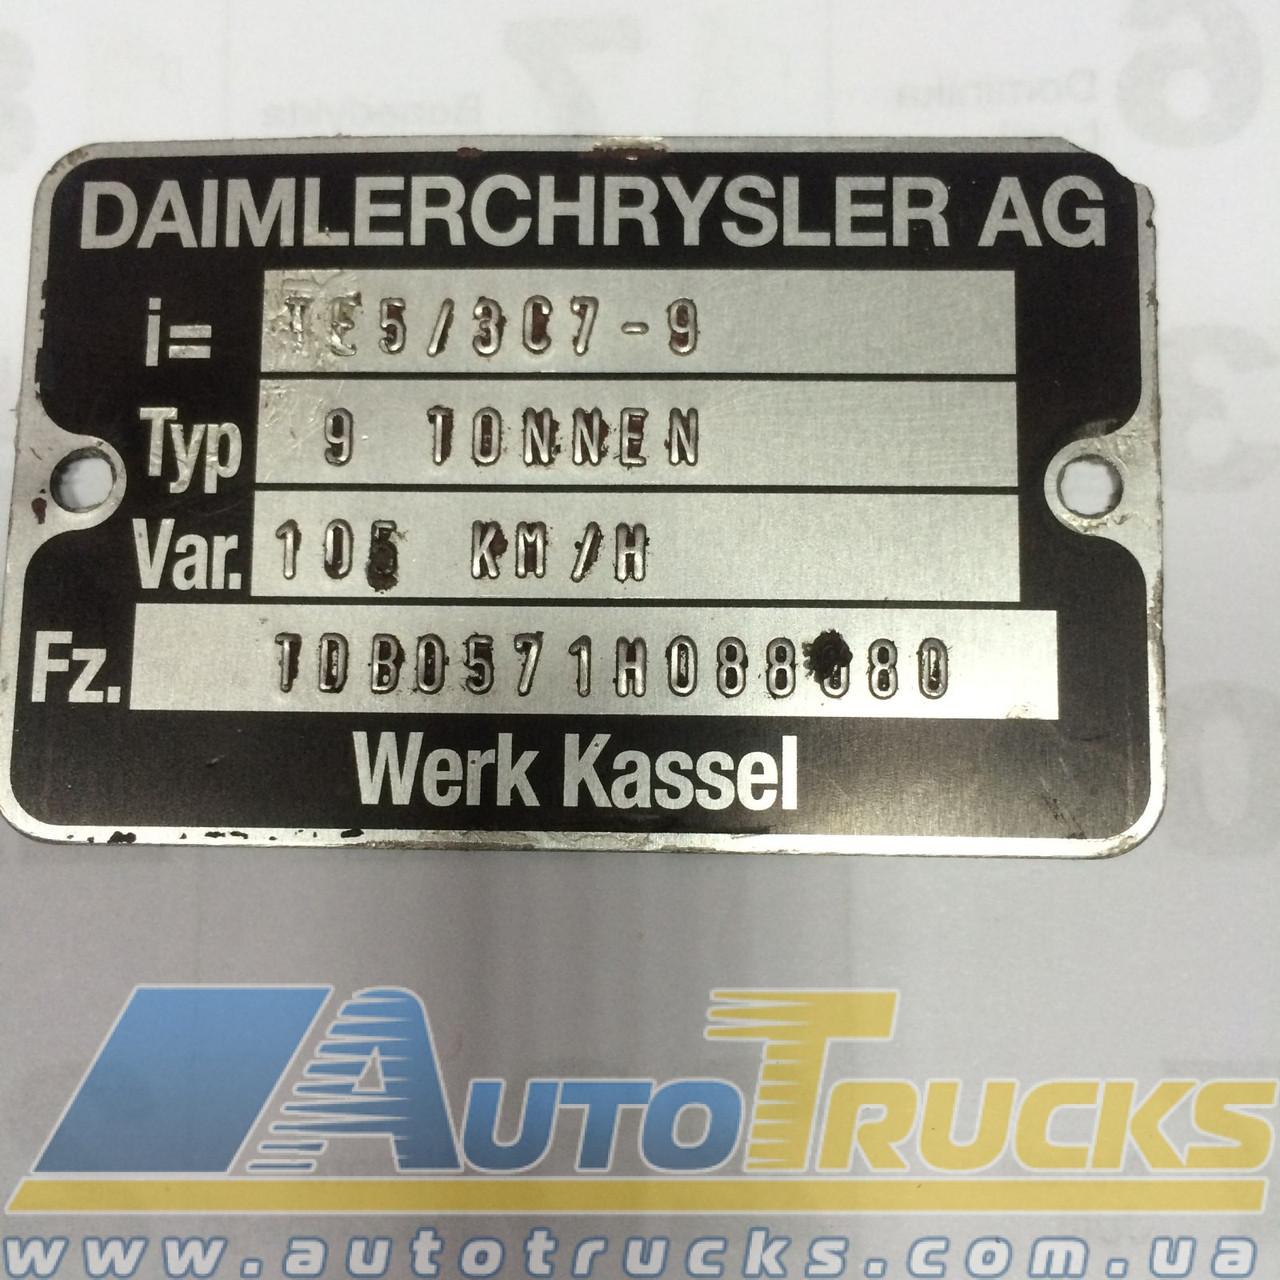 Ось; Mercedes-Benz, TE5/3C7-9, 9 tonnen, 105 Km/H, KOGEL Б/у для Mercedes-Benz,  Прицепа (TDB0571H088080)